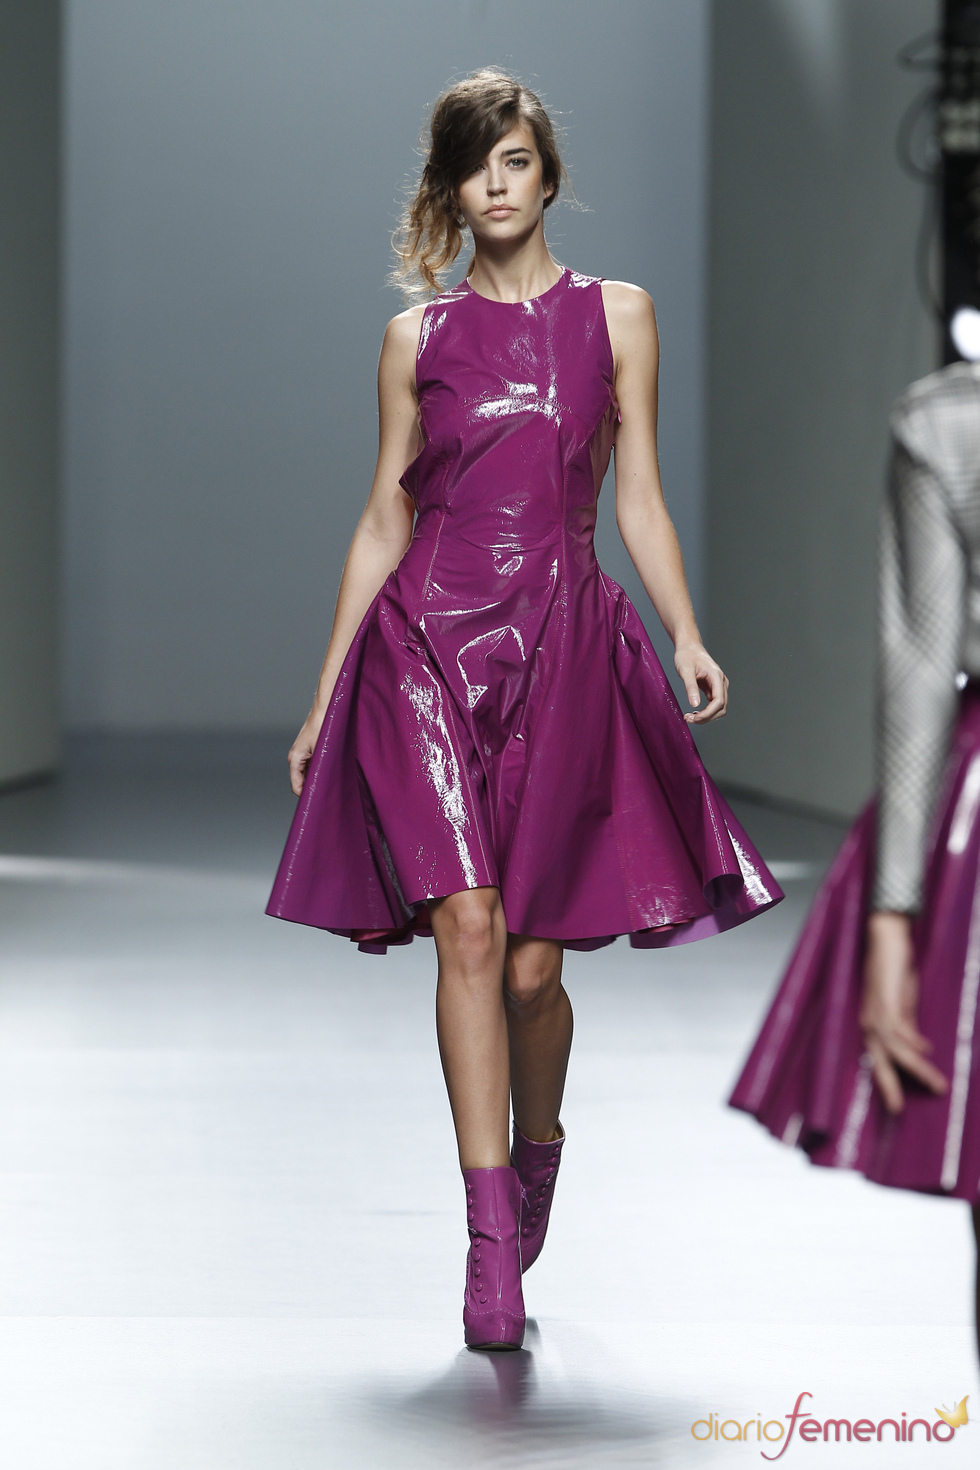 Espectacular vestido deTeresa Helbig O/I 2011-12. Cibeles Madrid Fashion Week